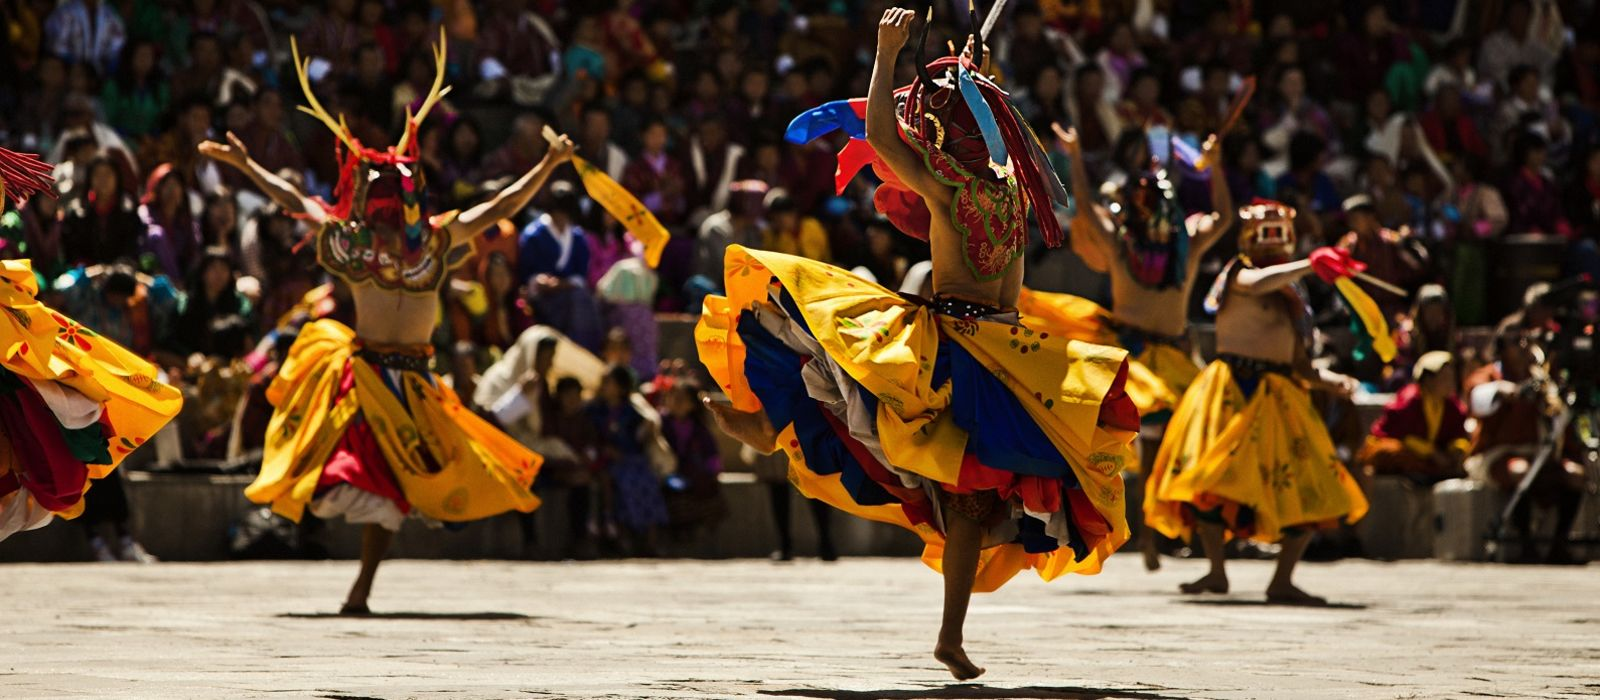 Luxury Bhutan & Thailand Paradise Islands Tour Trip 6